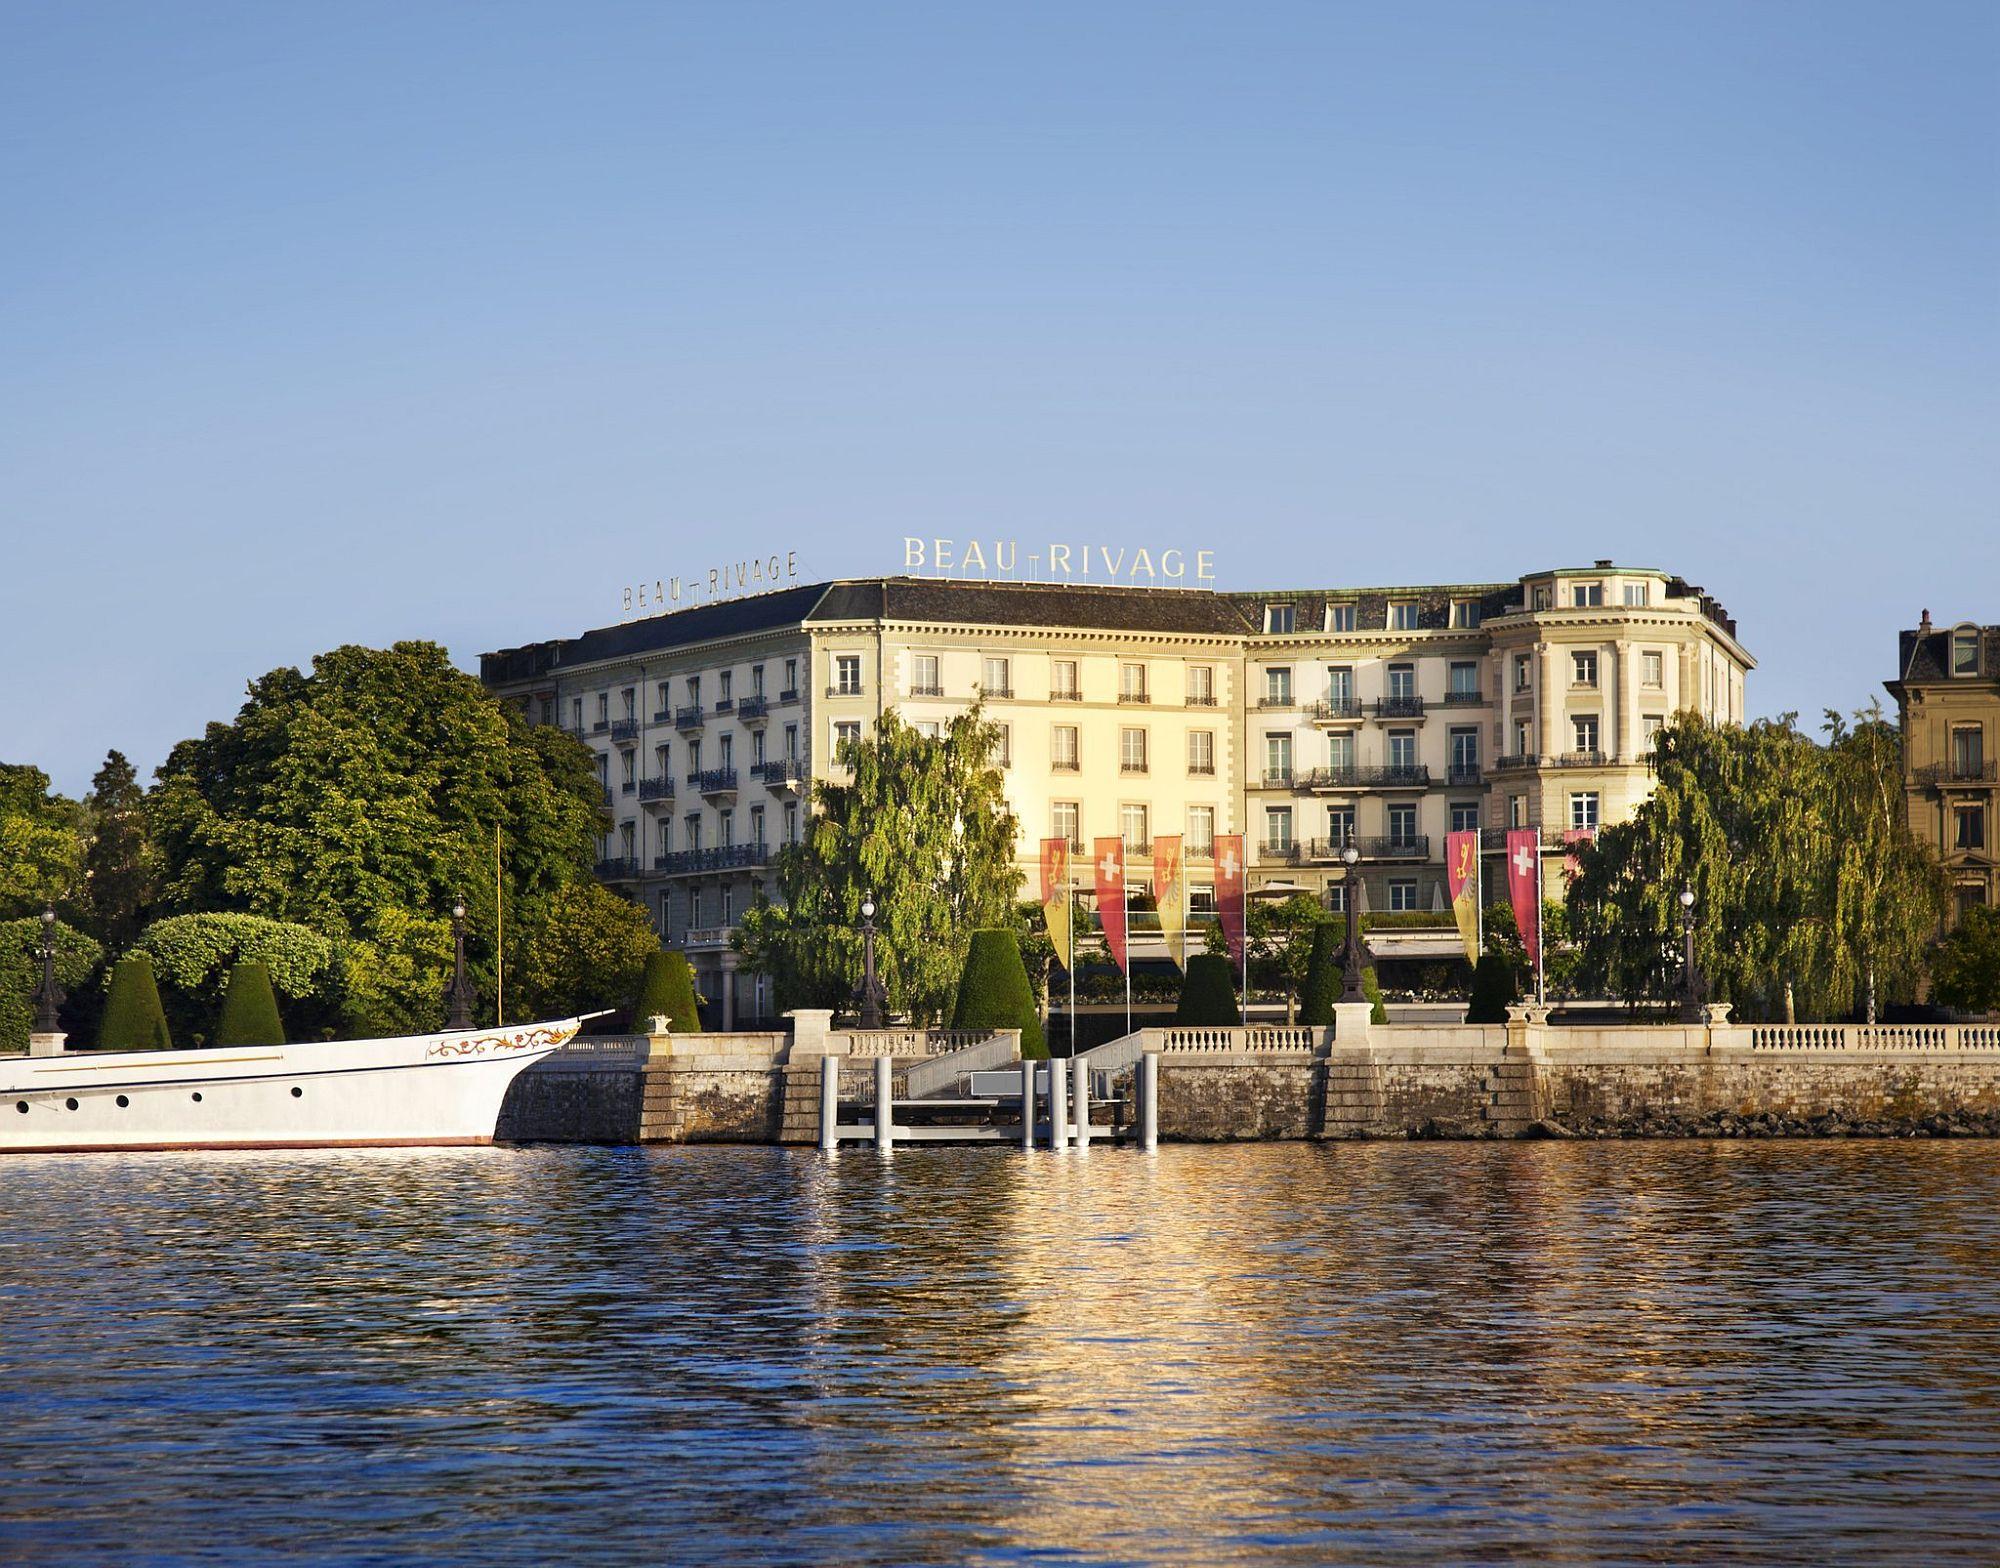 Main facade of the Hotel Beau Rivage in Geneva